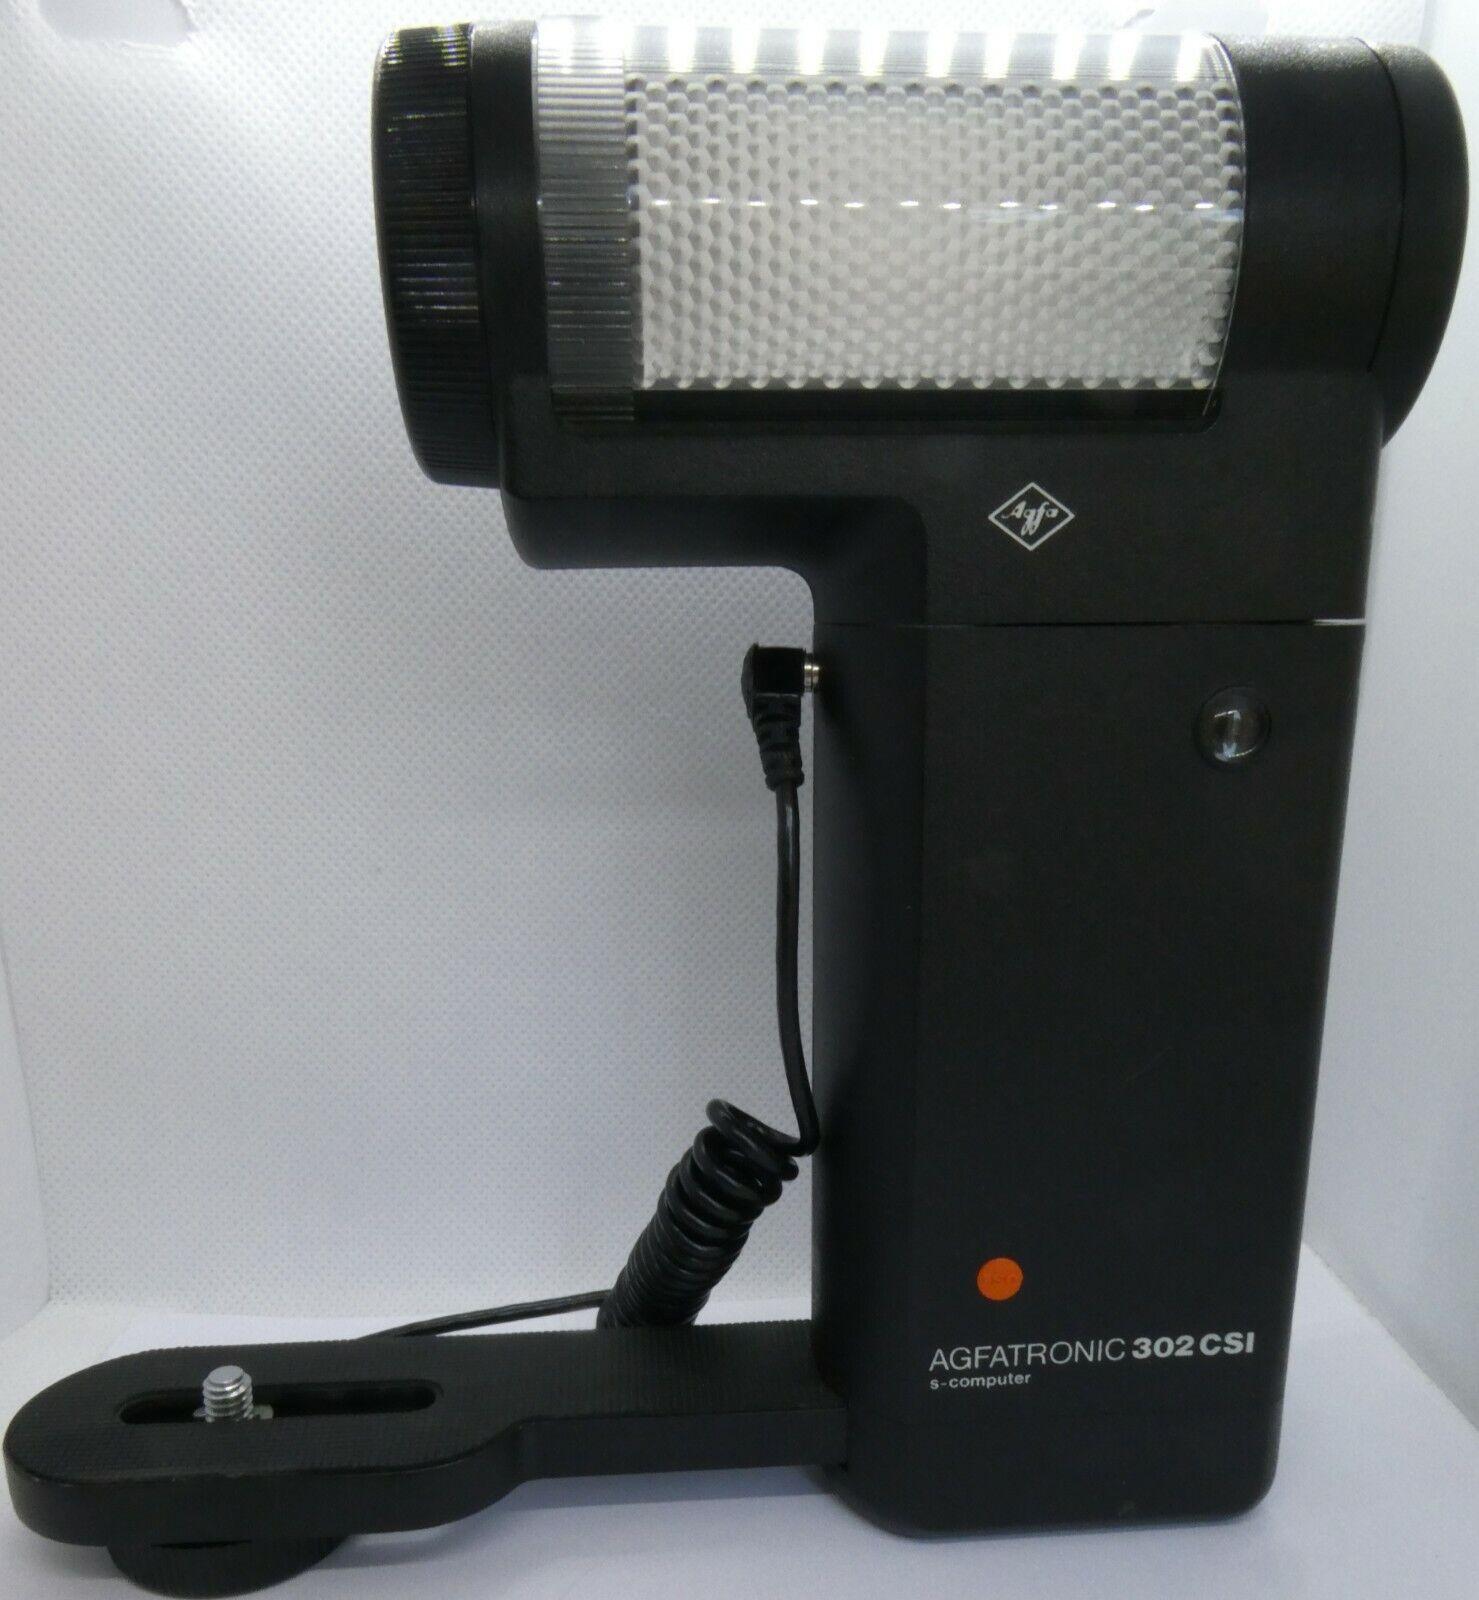 Vintage Agfatronic 302CSI s-computer Flash Gun with Camera Bracket